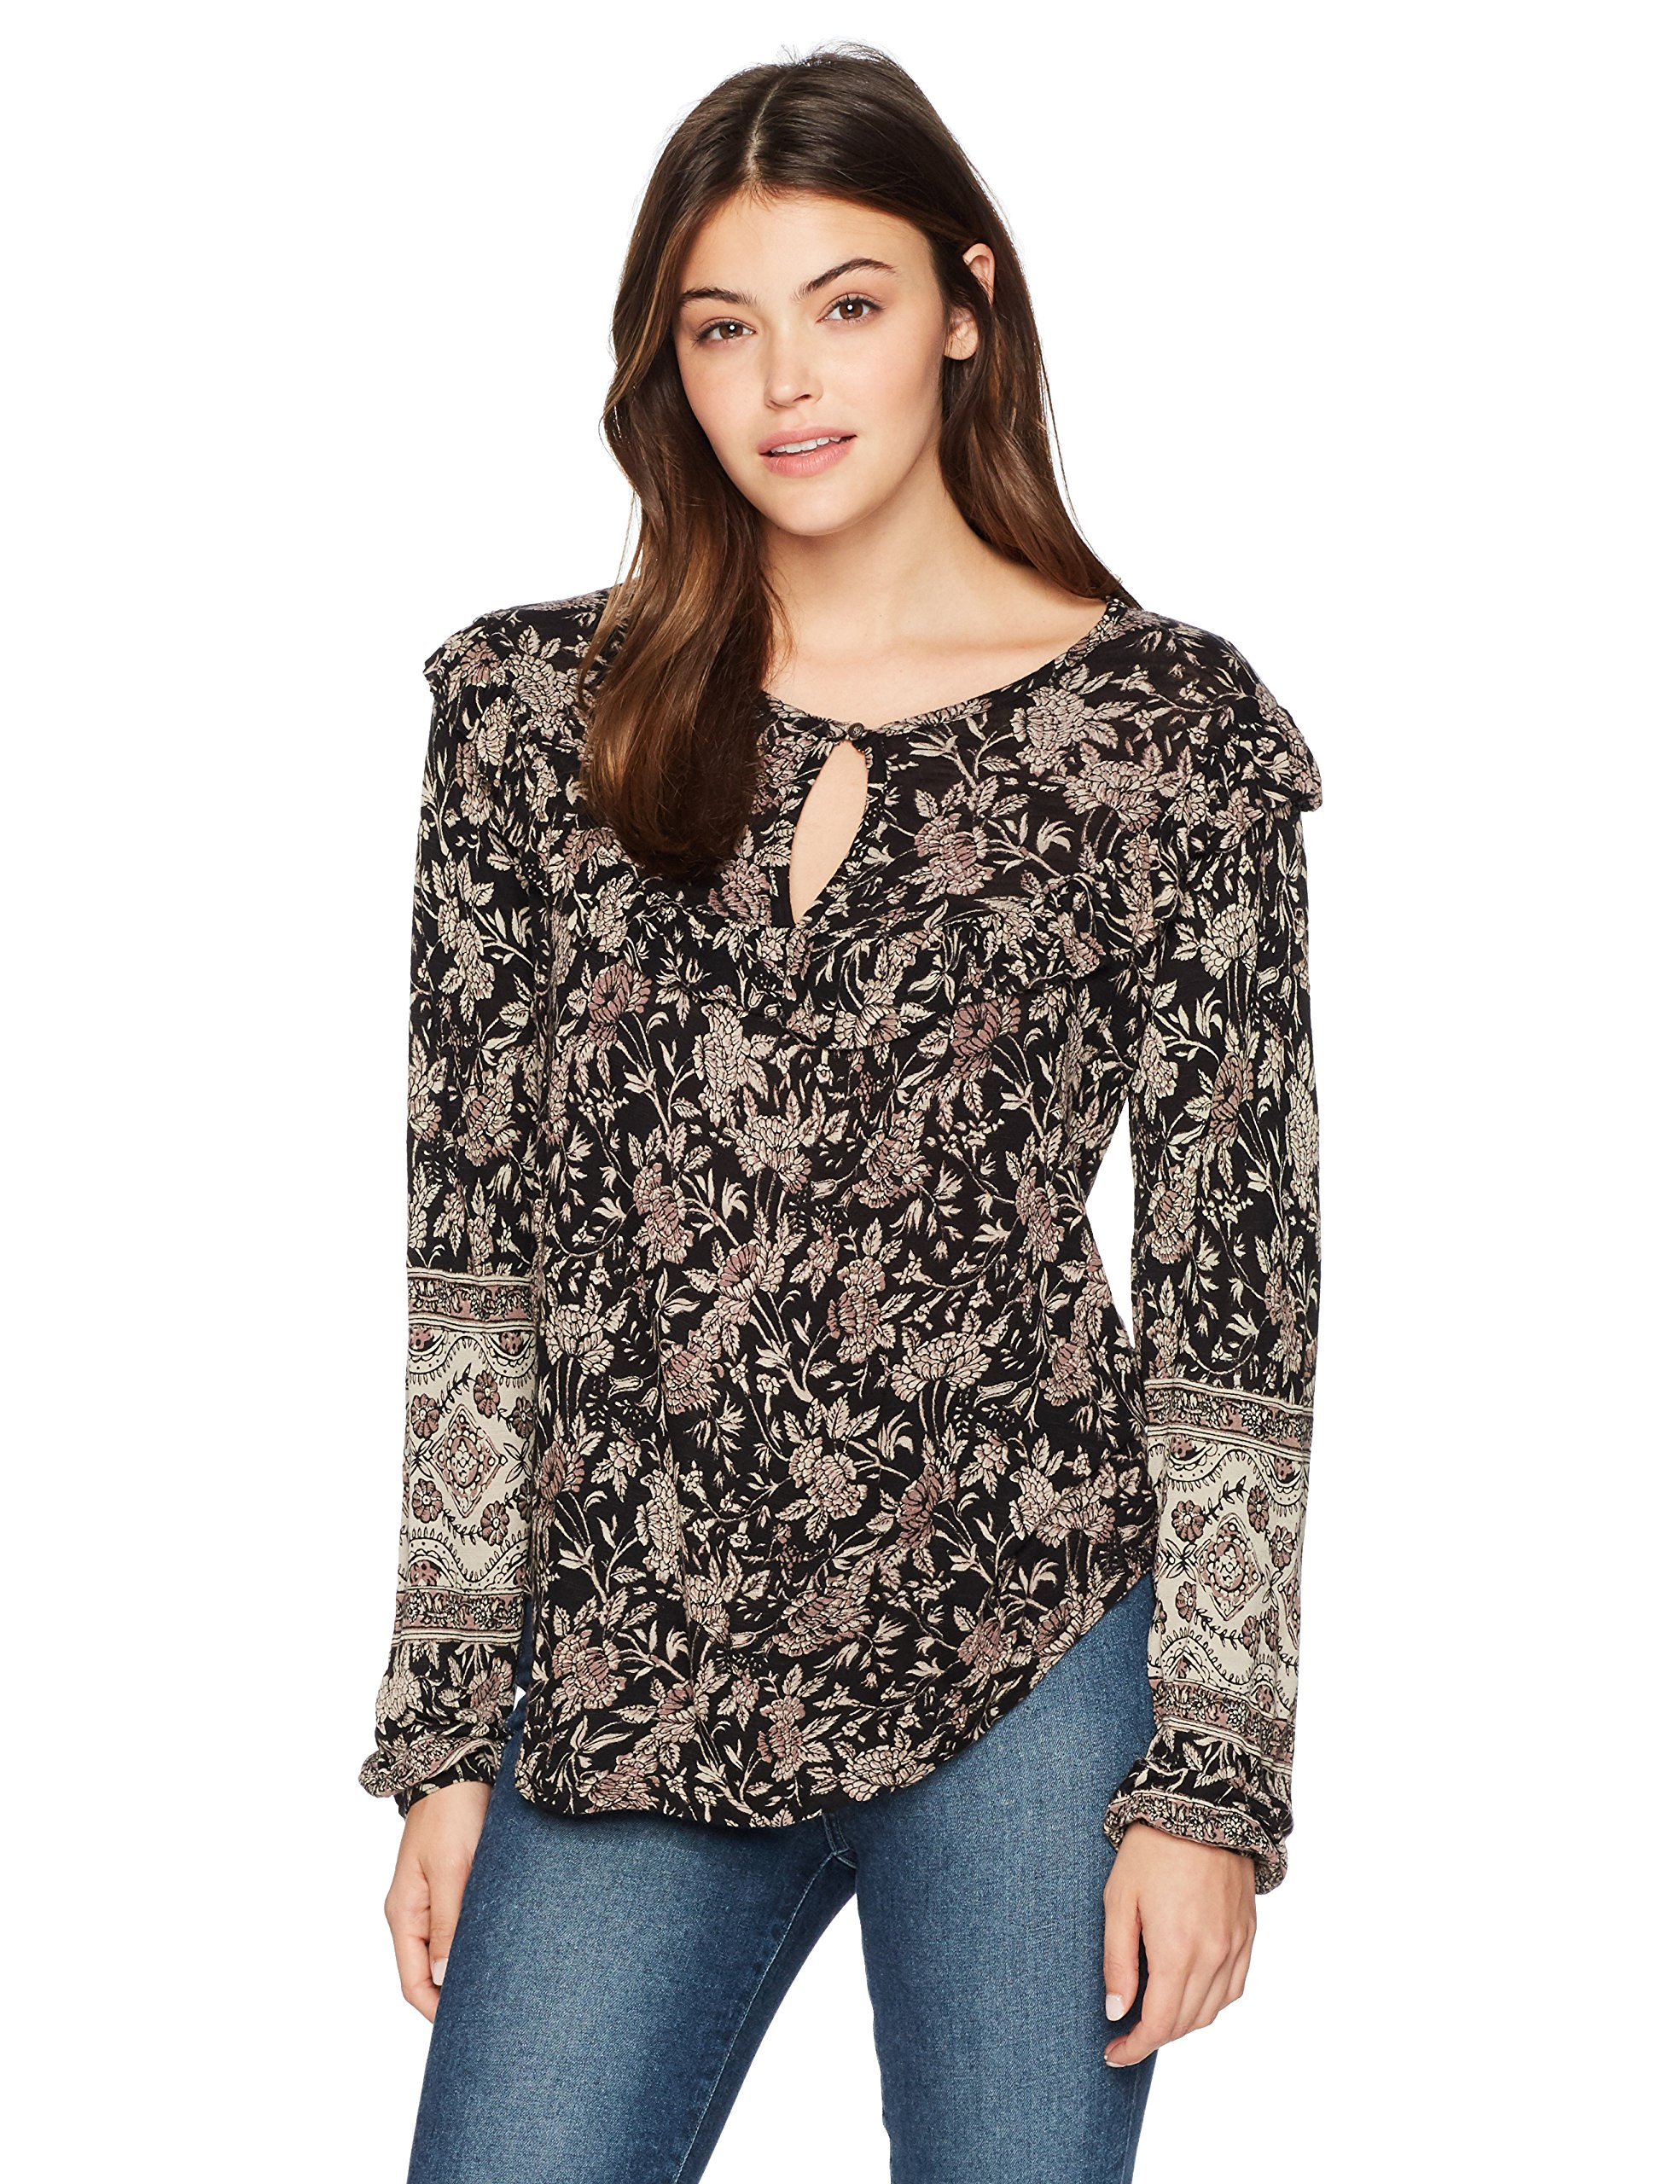 Lucky Brand Women's Mixed Print Ruffle Top, Black/Multi, L